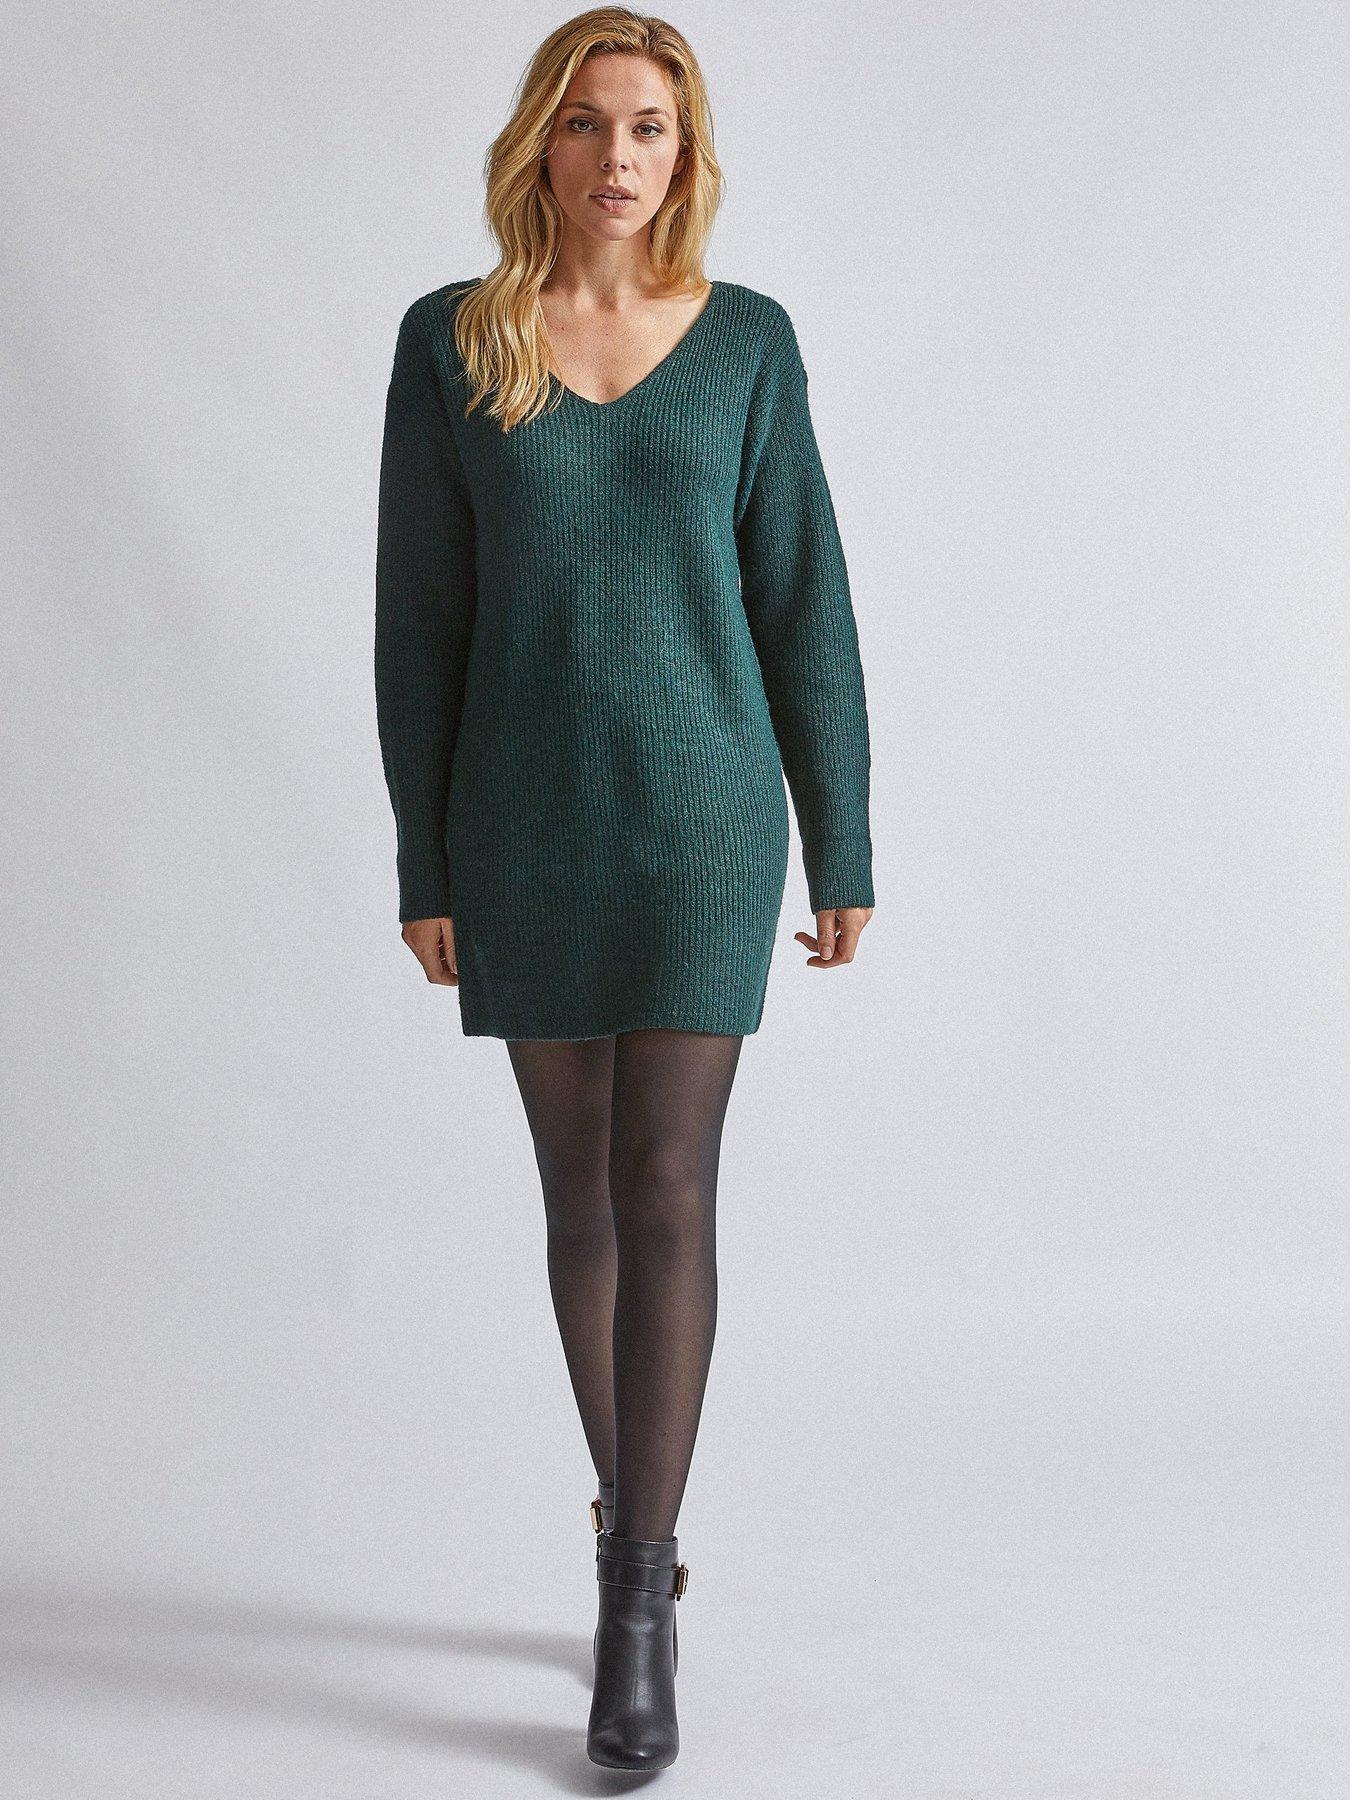 Dorothy Perkins Womens Green V-Neck Tunic Jumper